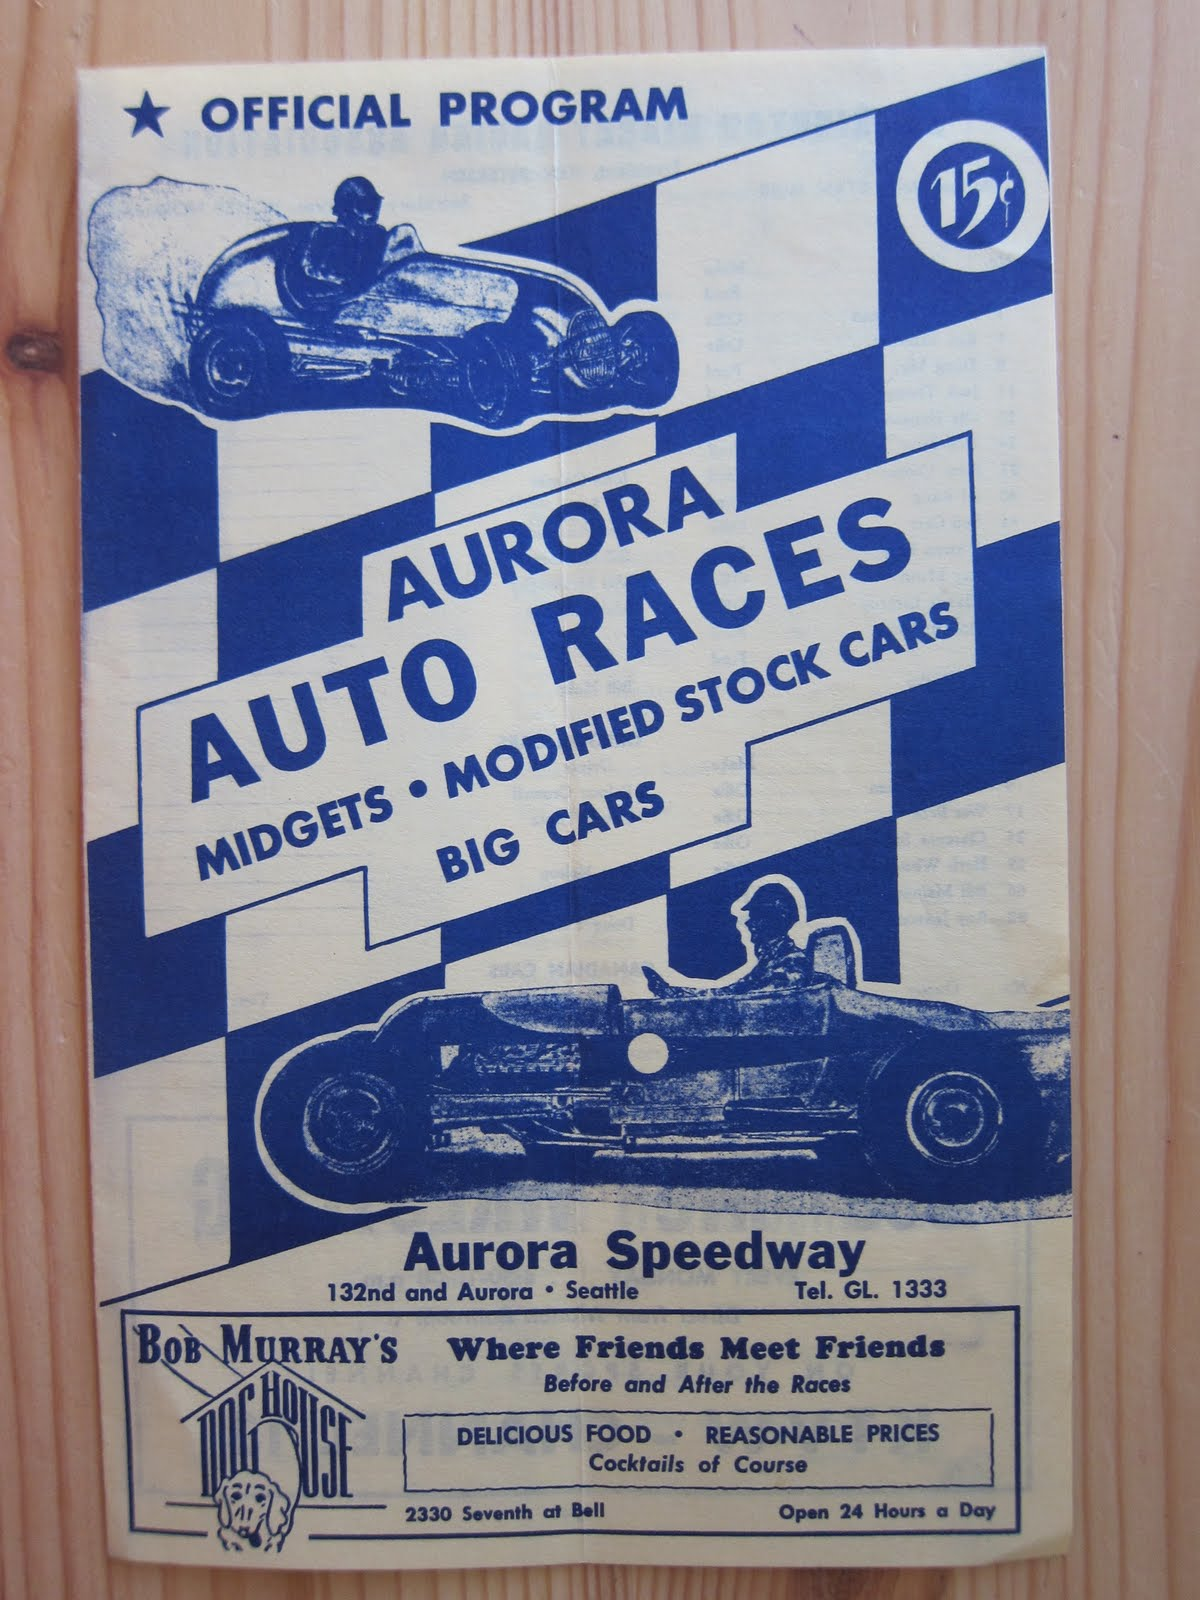 Northwest Auto Racing, 1950s: June 2011